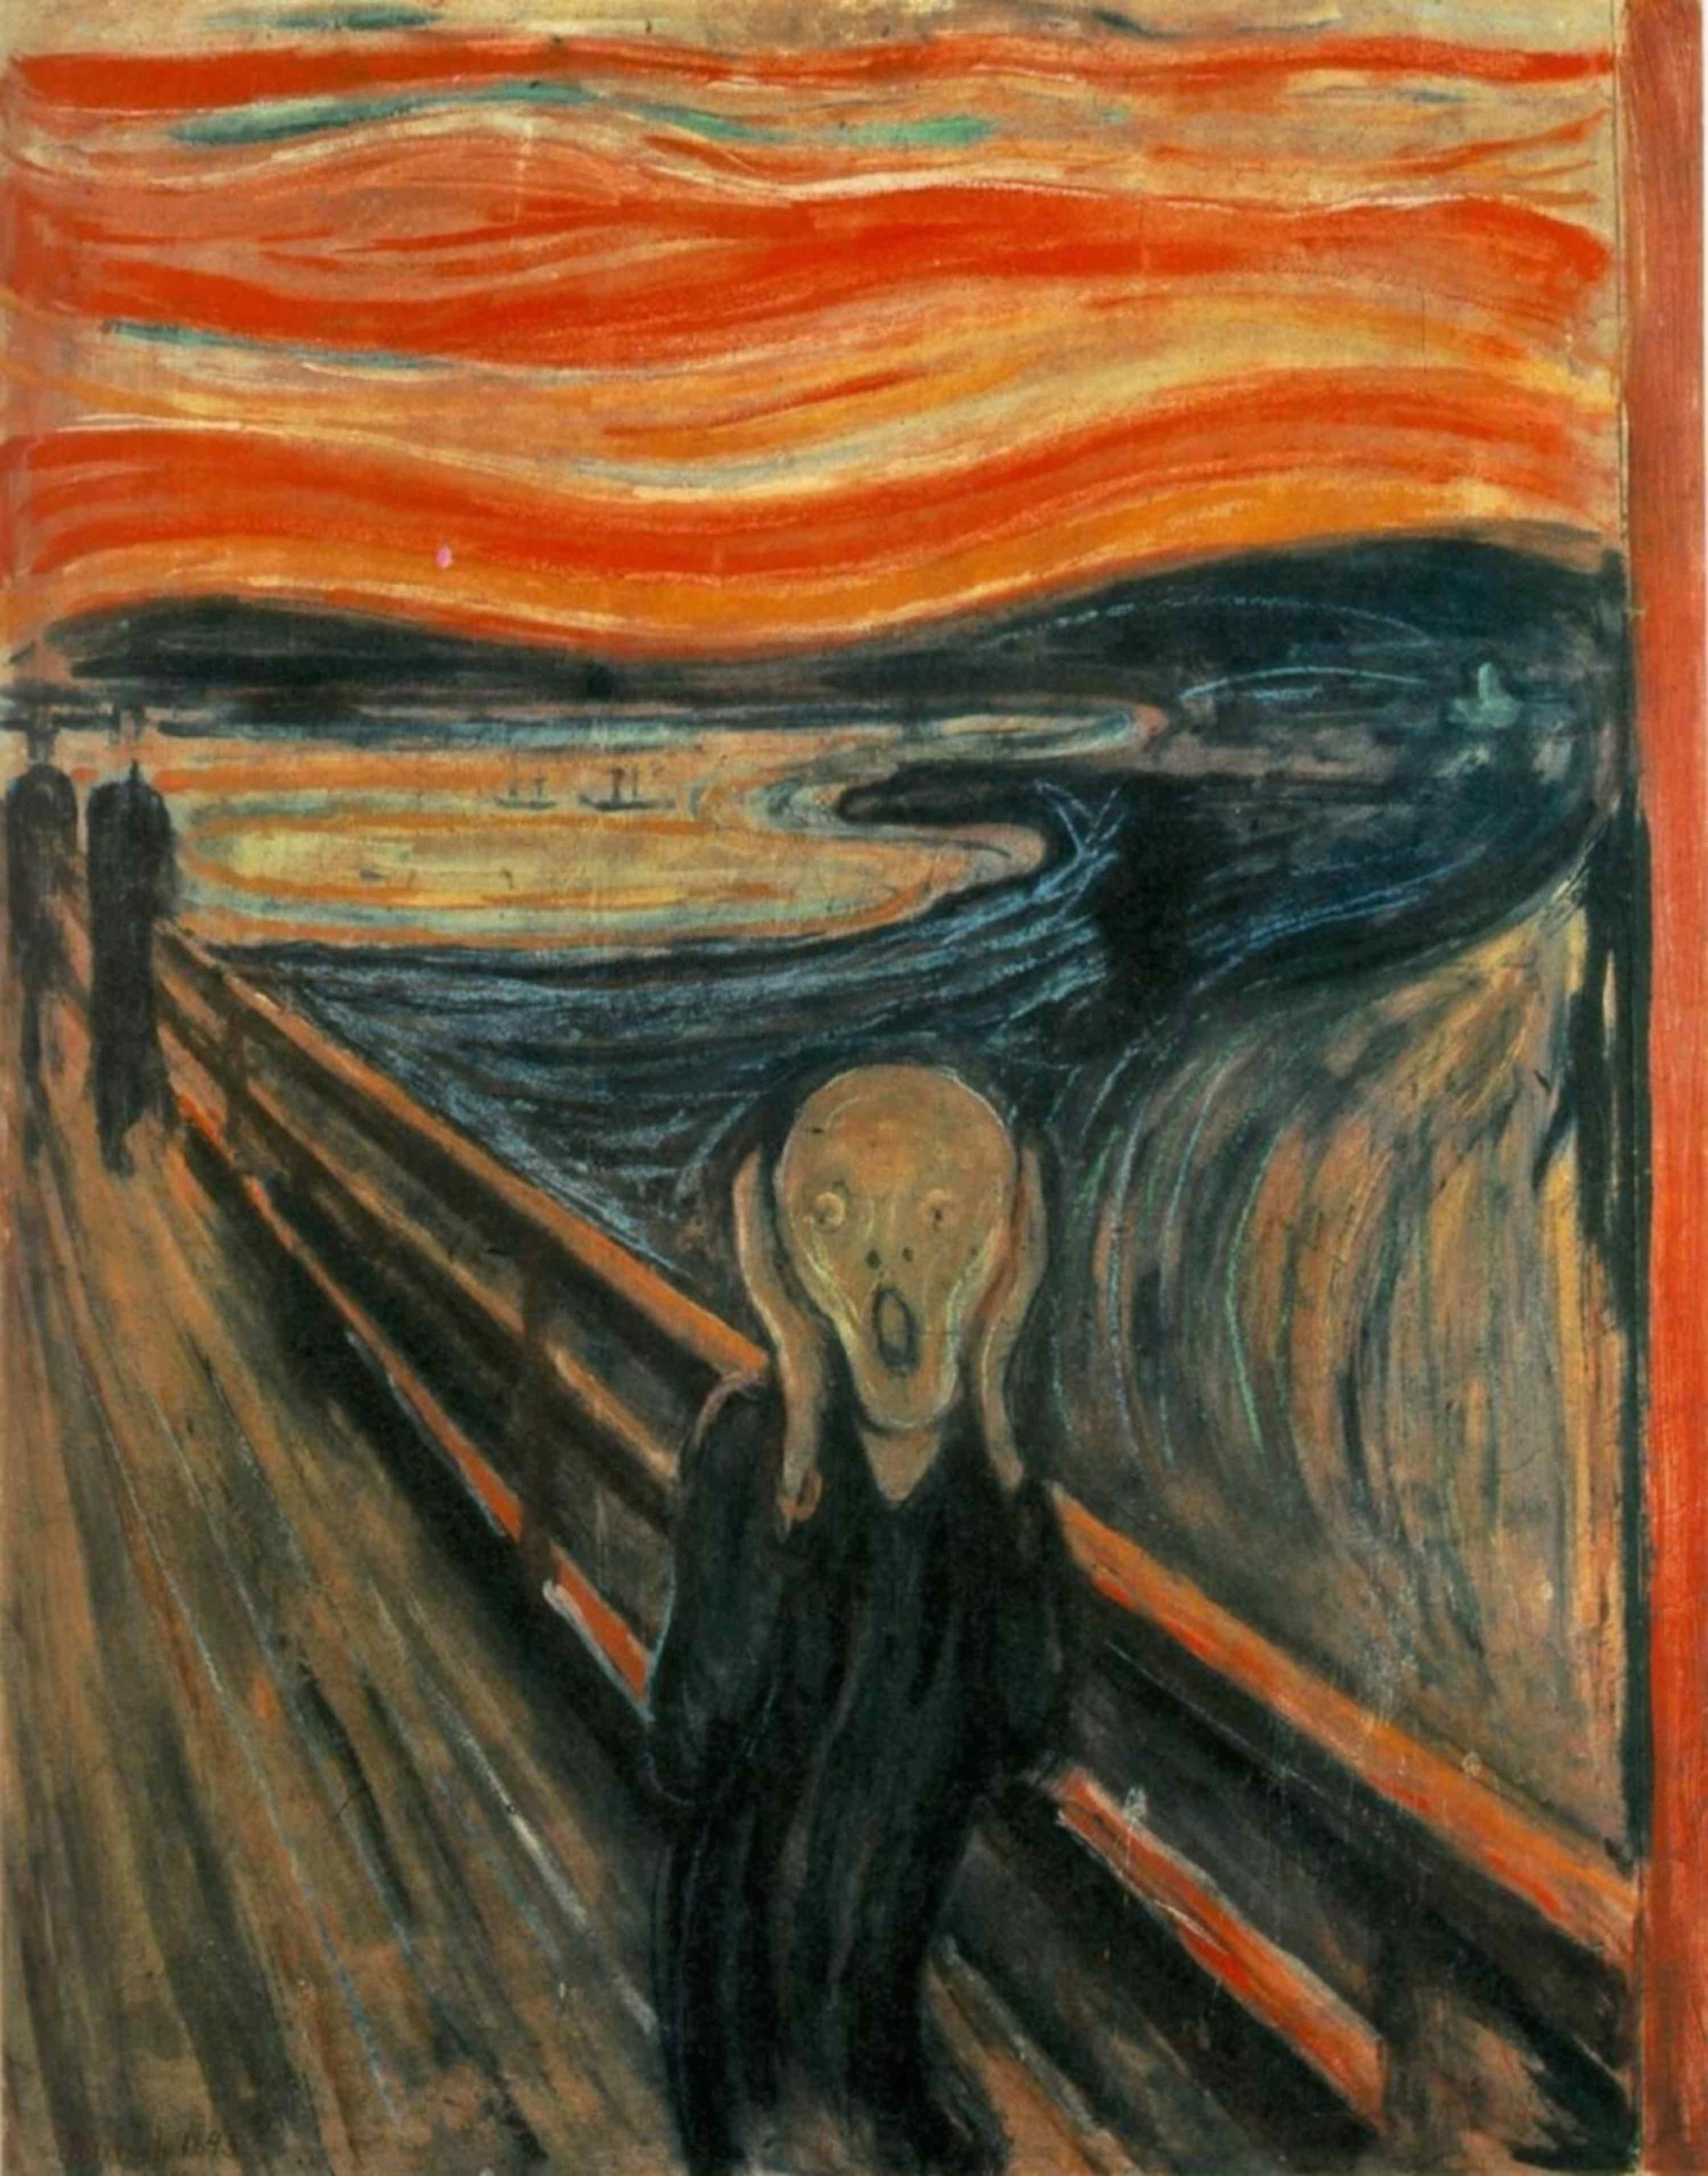 Edvard Munch - The Scream.